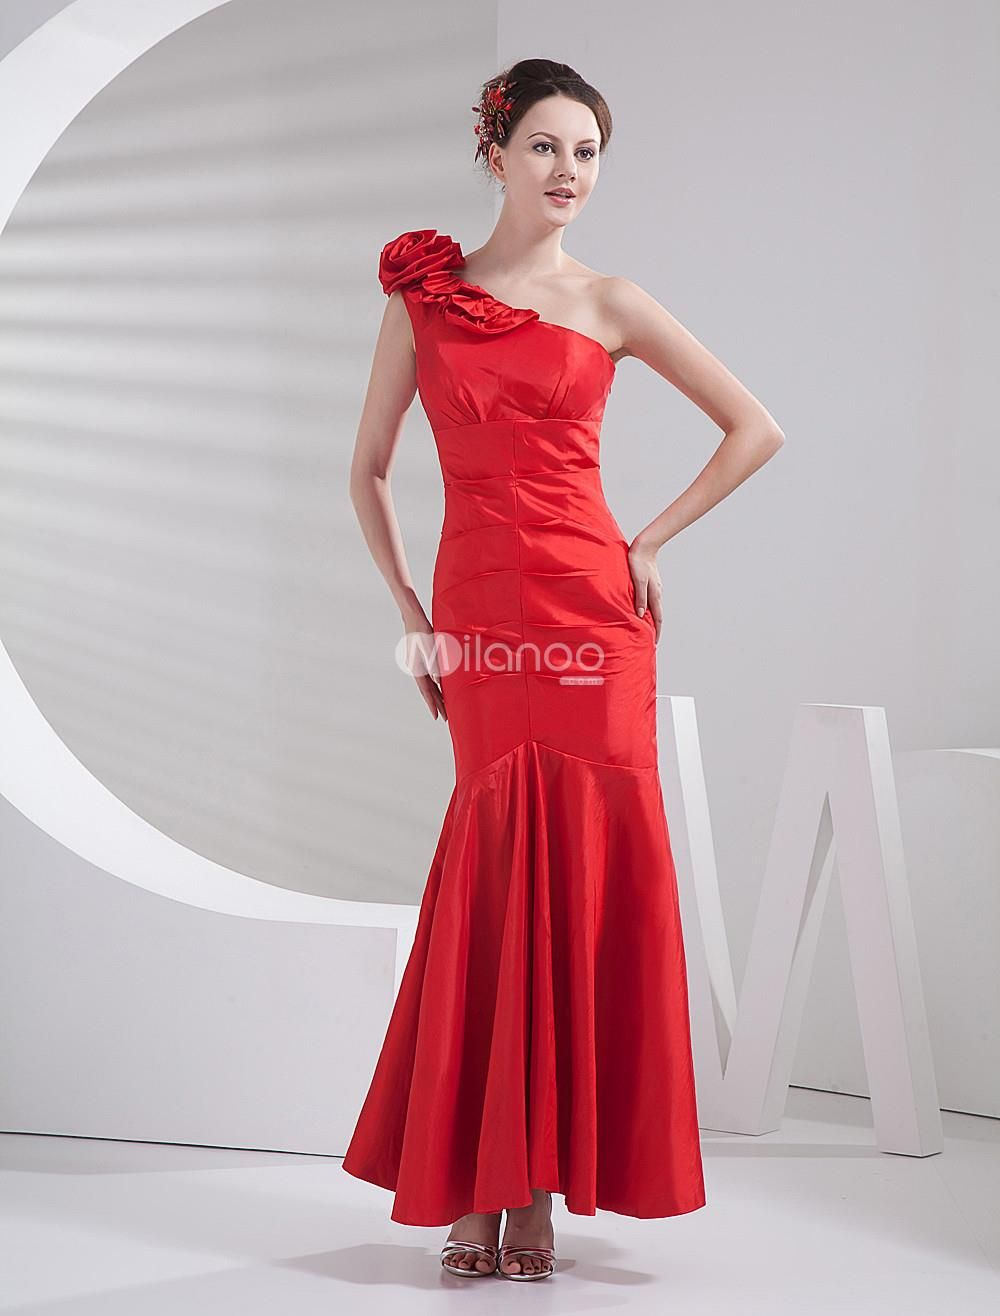 20+ Red mermaid trumpet wedding dress ideas